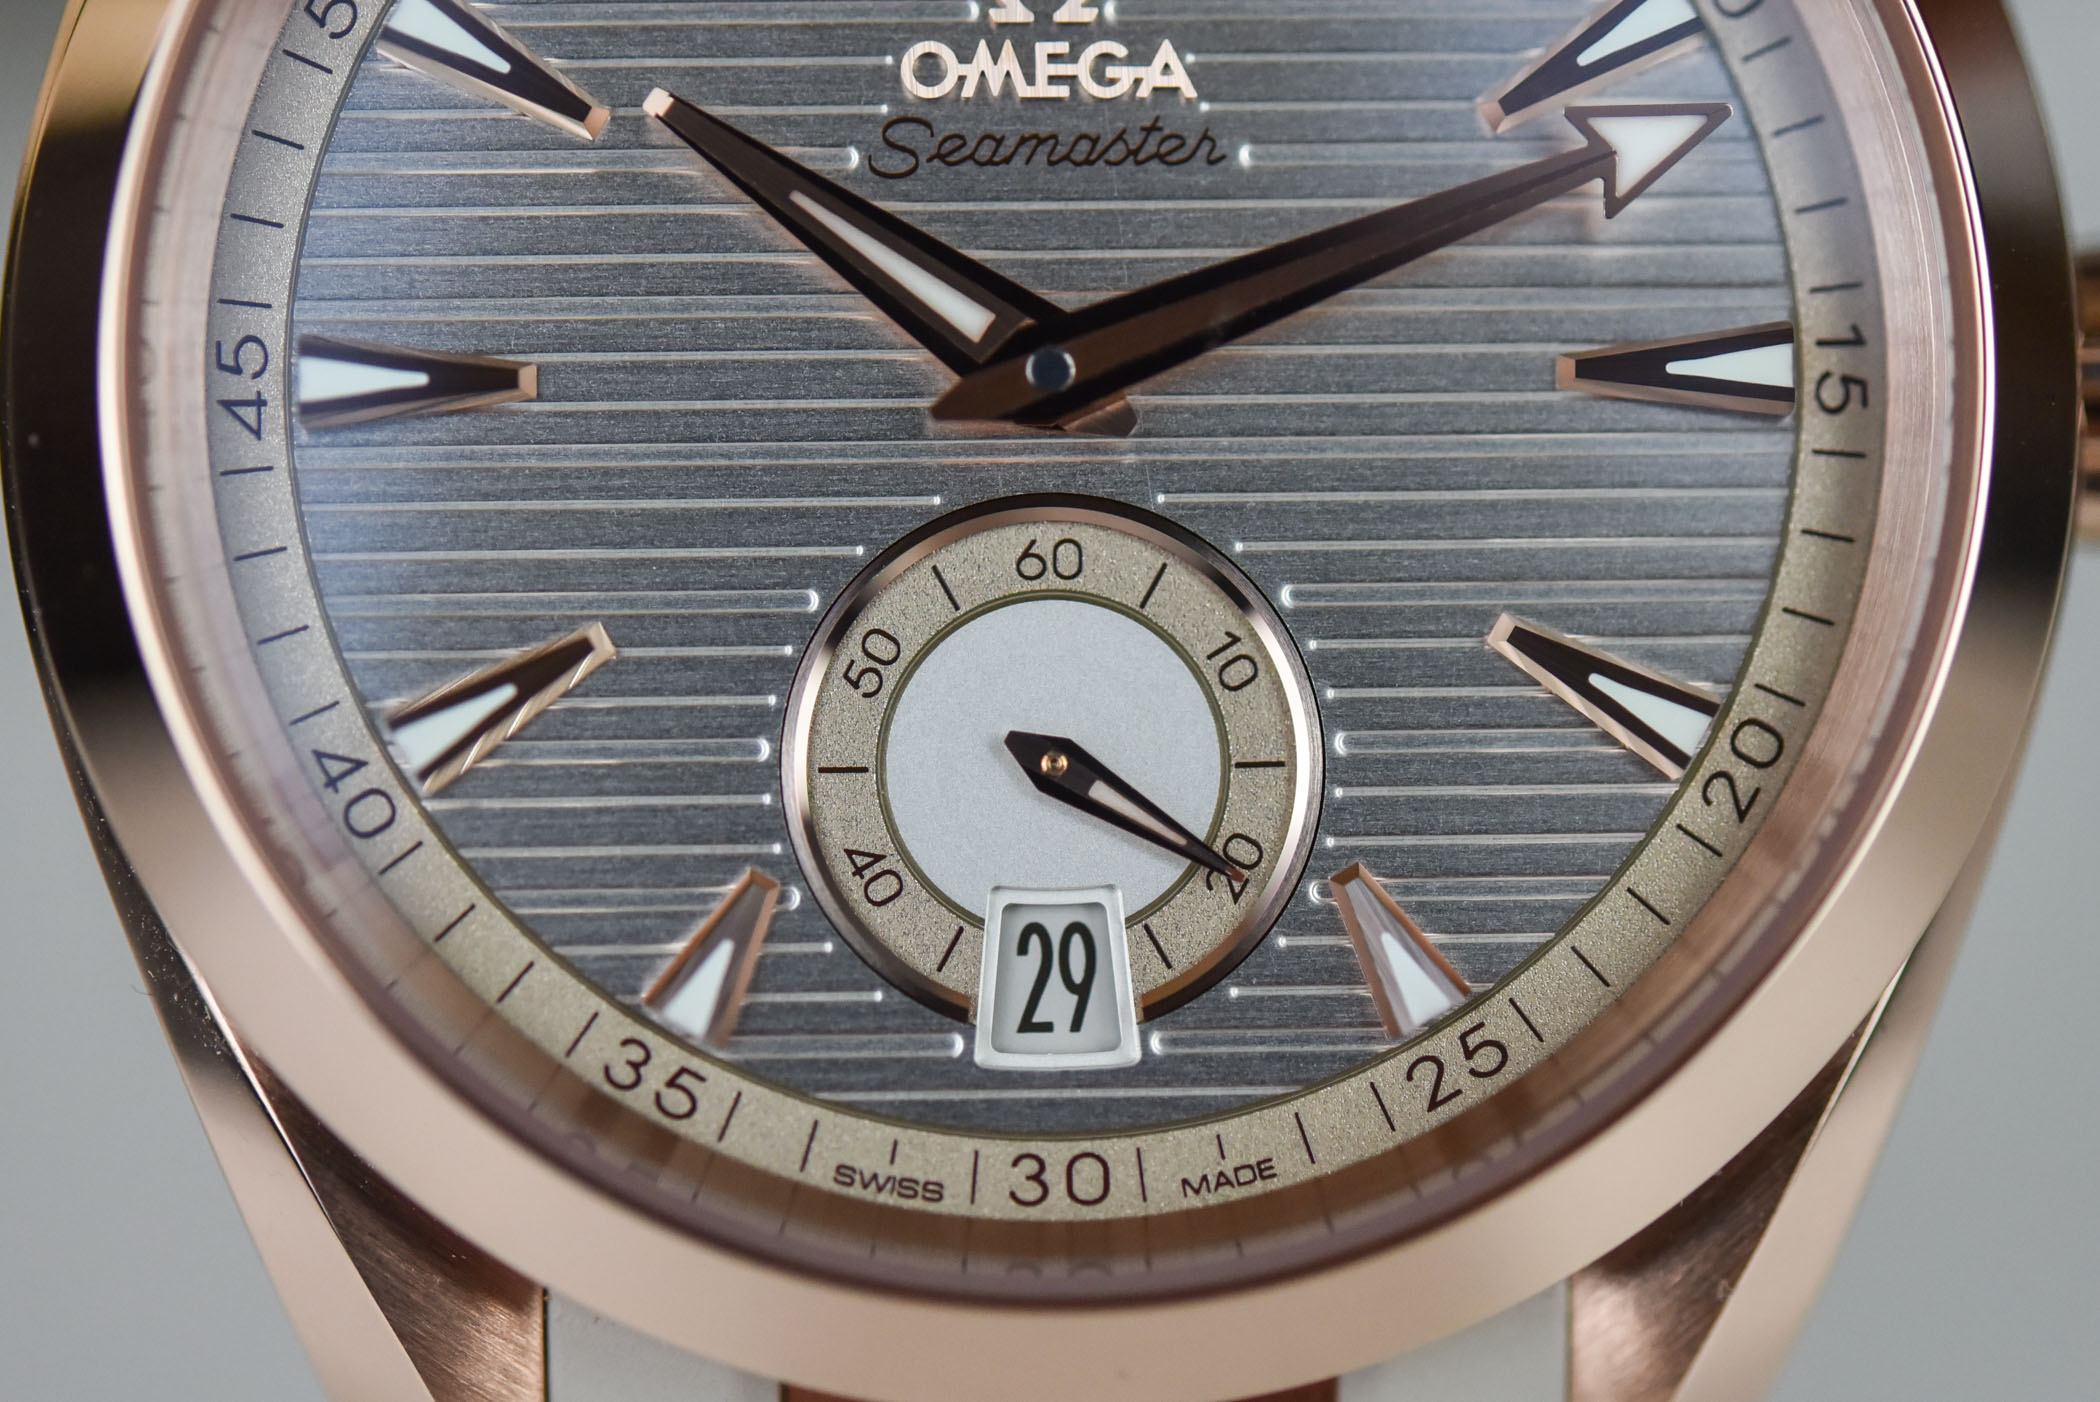 2021 Omega Seamaster Aqua Terra Small Seconds Collection